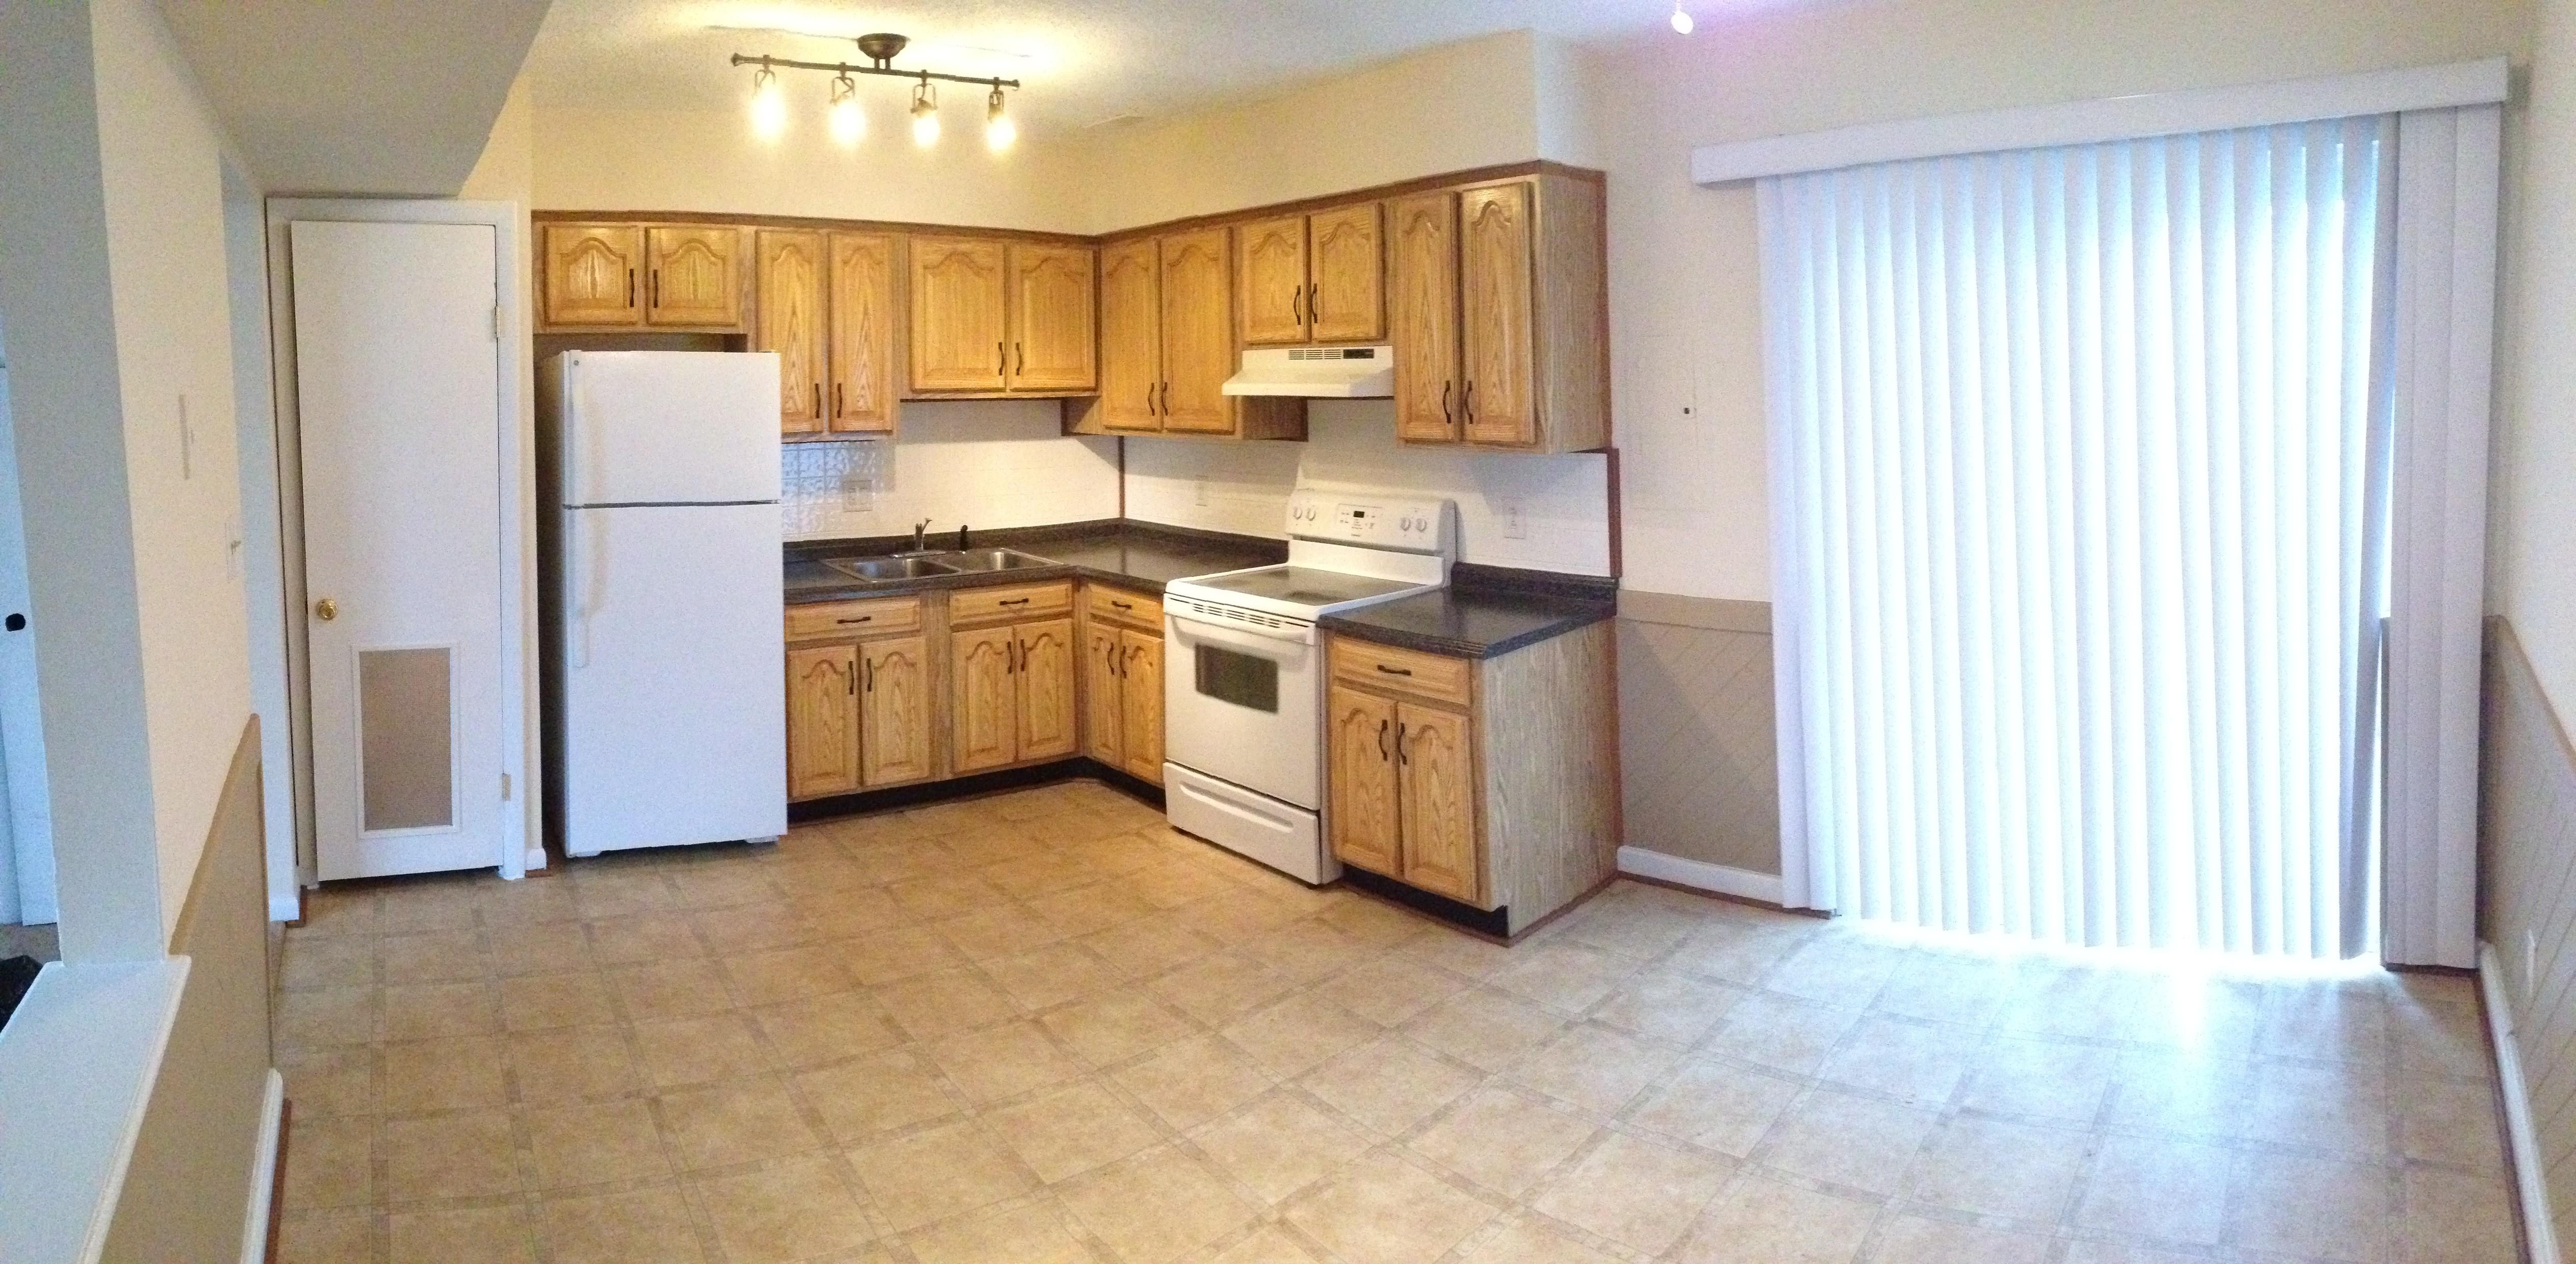 1031 coastaway dr virginia beach va 23451 3 bedroom apartment for rent padmapper for 4 bedroom apartments virginia beach